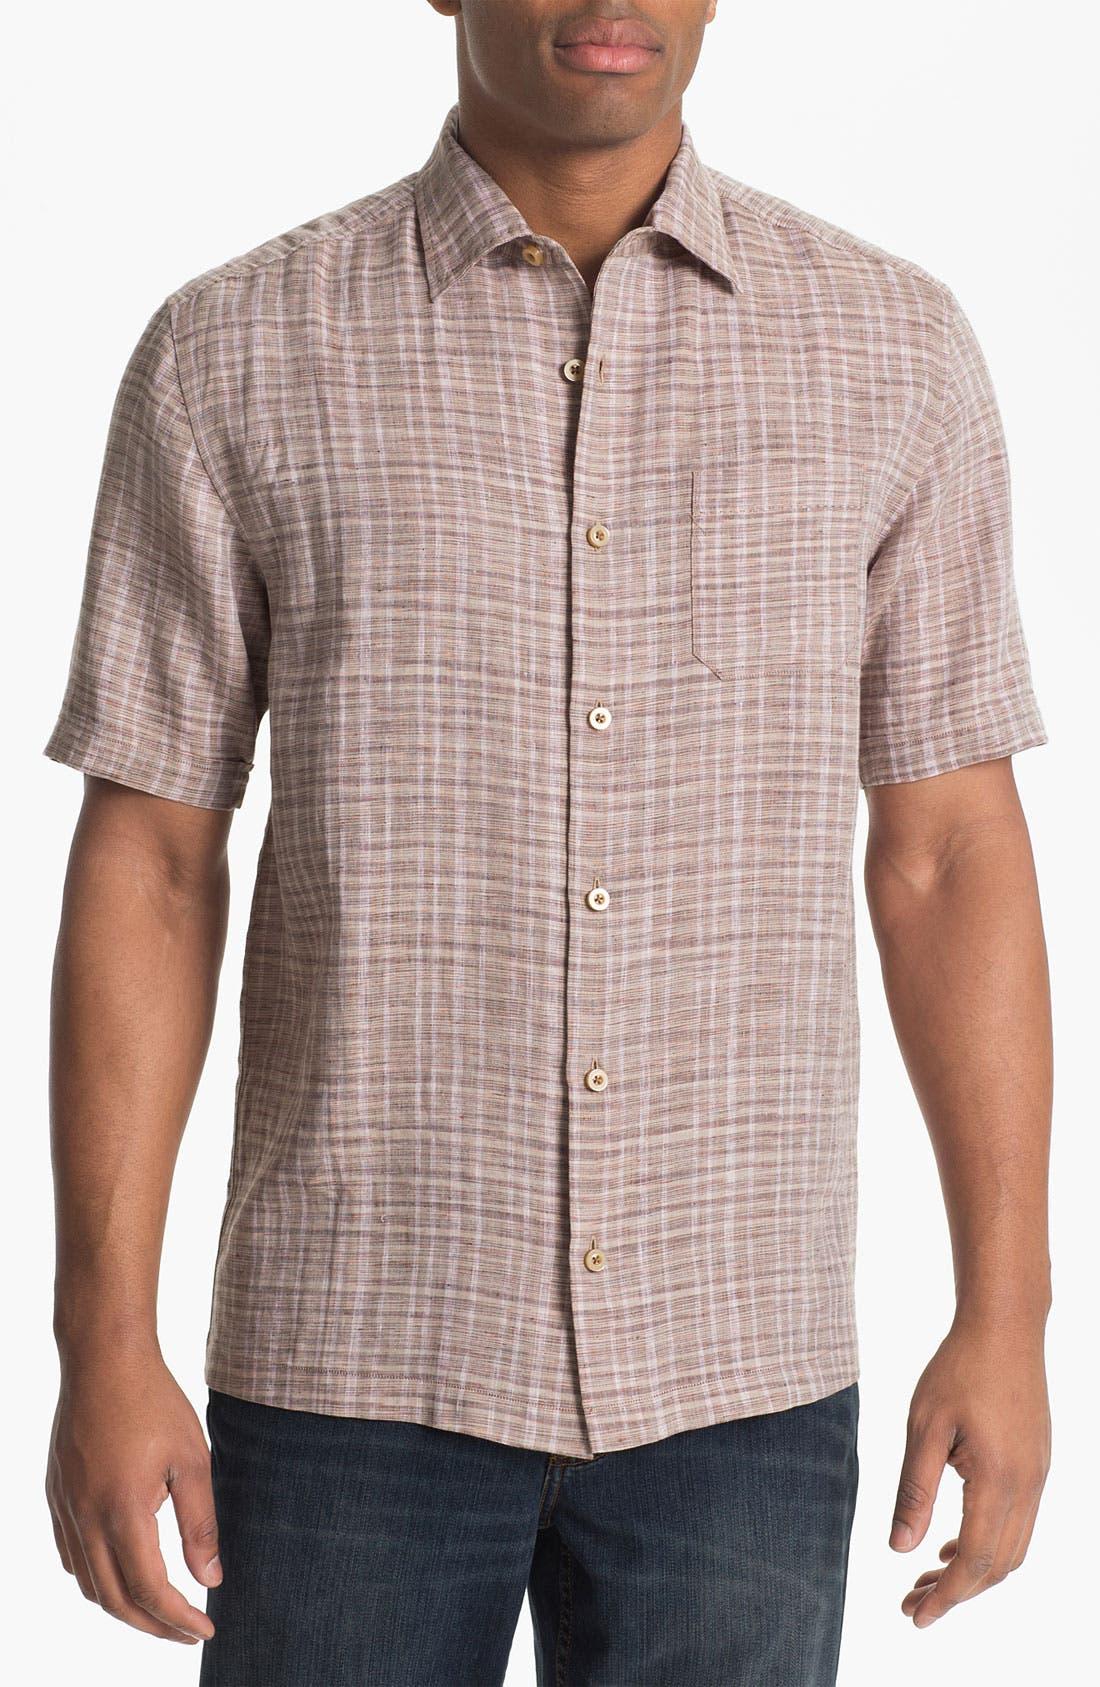 Main Image - Tommy Bahama 'Bravo Blanco' Linen Campshirt